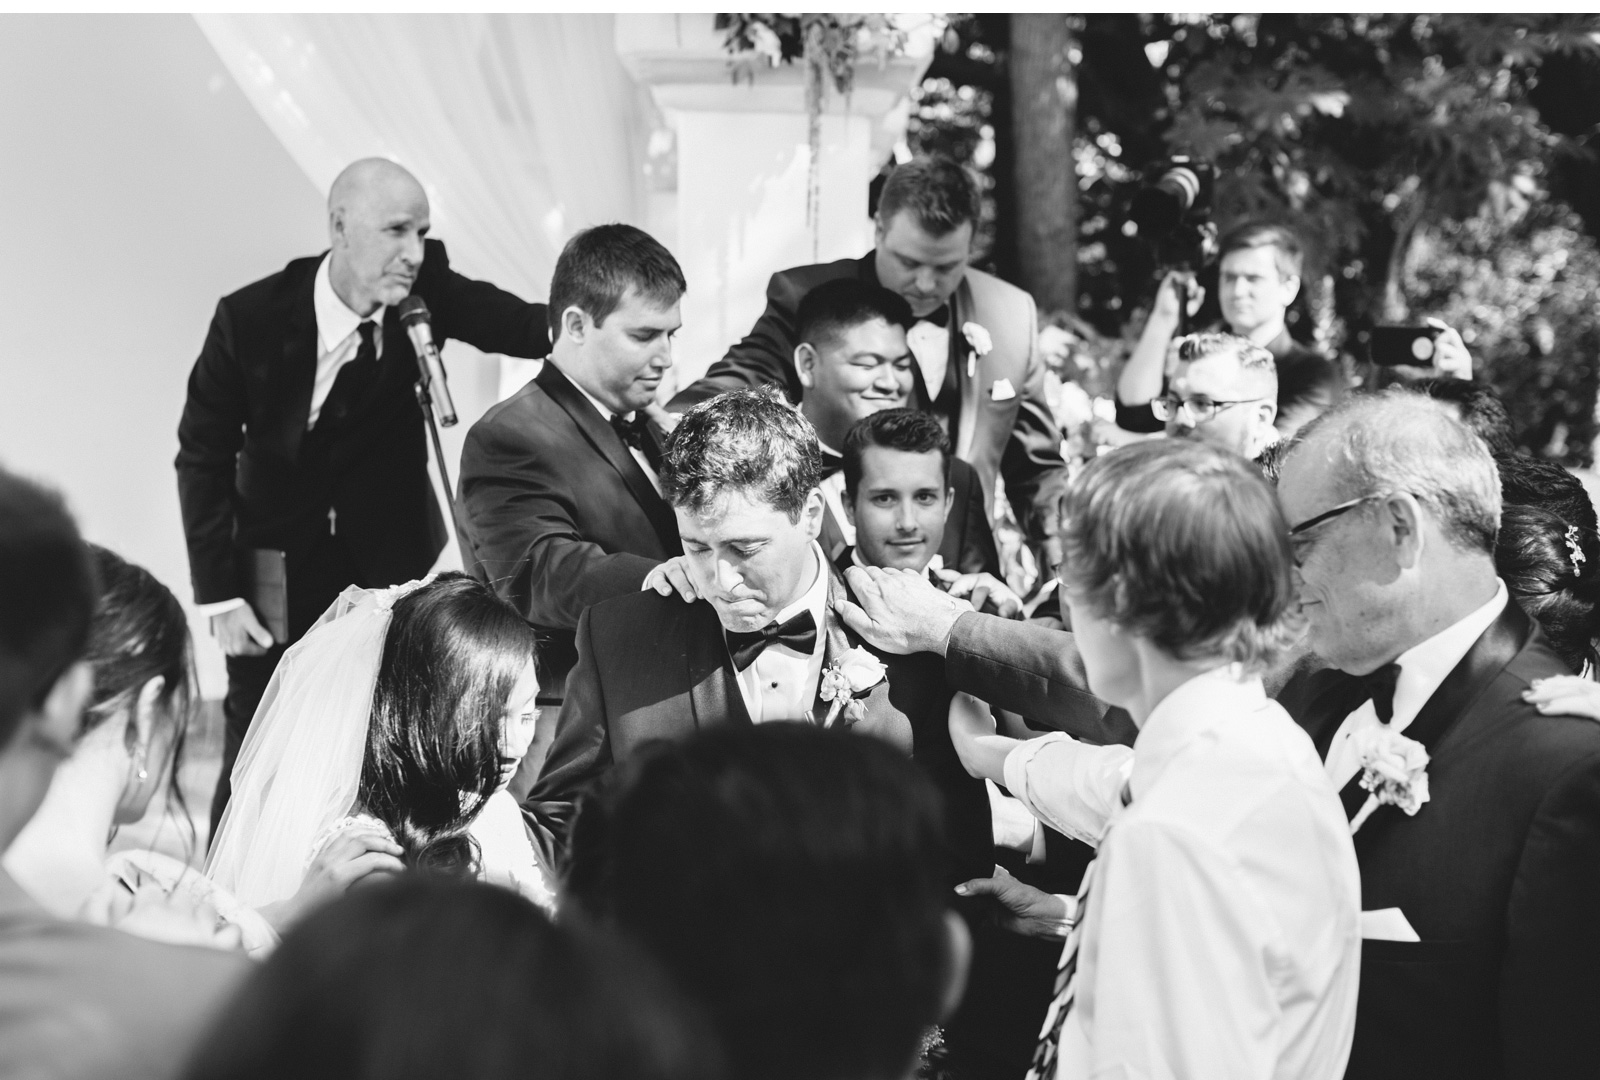 Malibu-Wedding-Triunfo-Creek-Natalie-Schutt-Photography_05.jpg